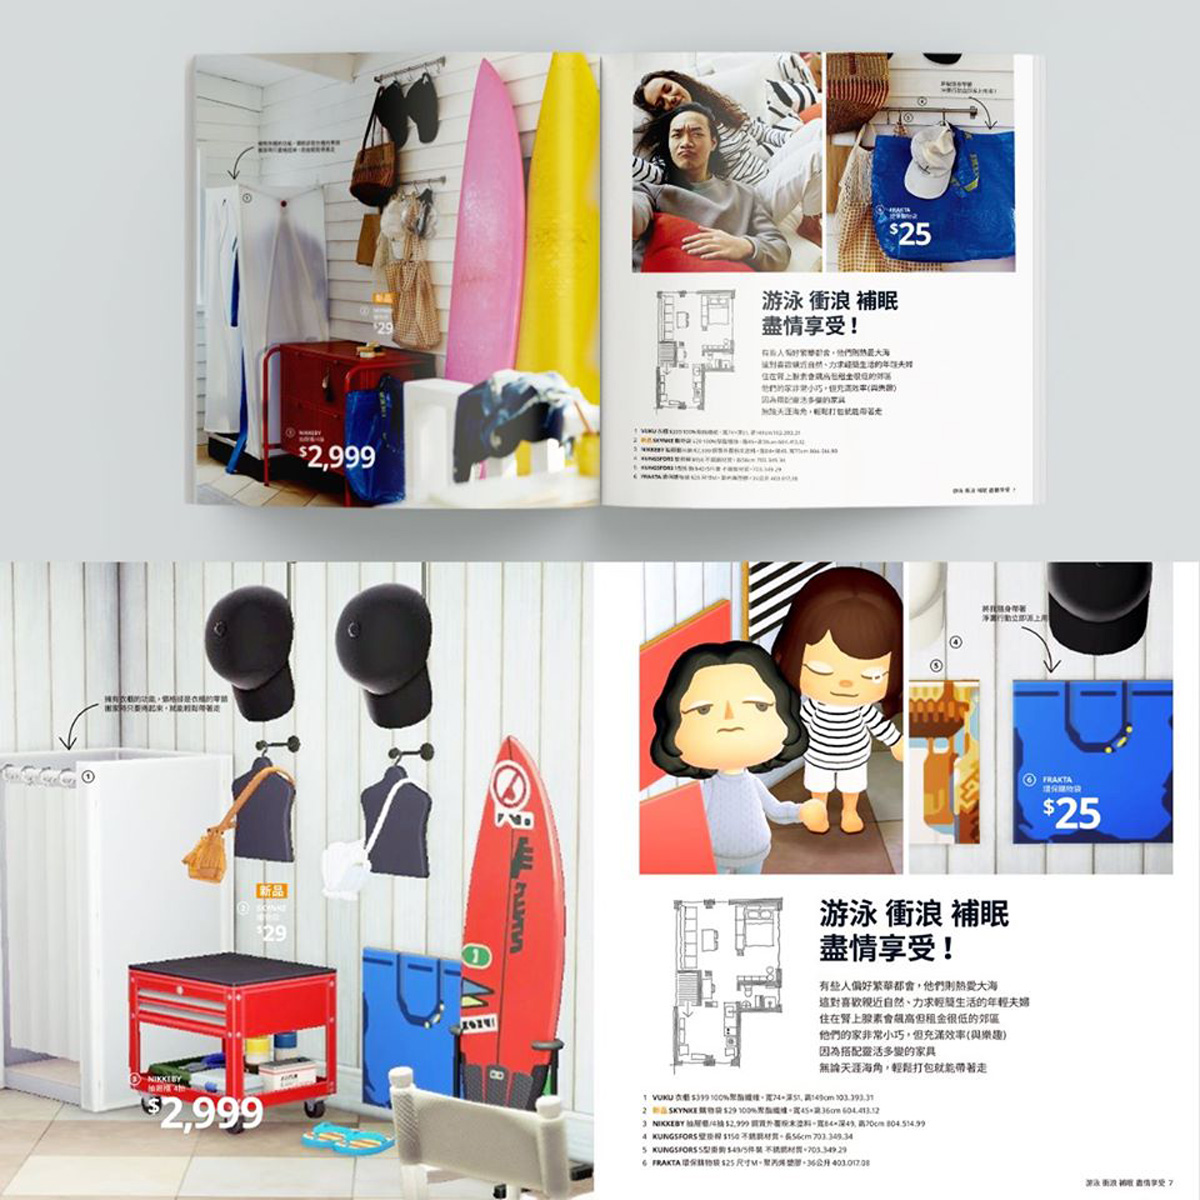 IKEA Taiwan 2021 Catalogue Animal Crossing